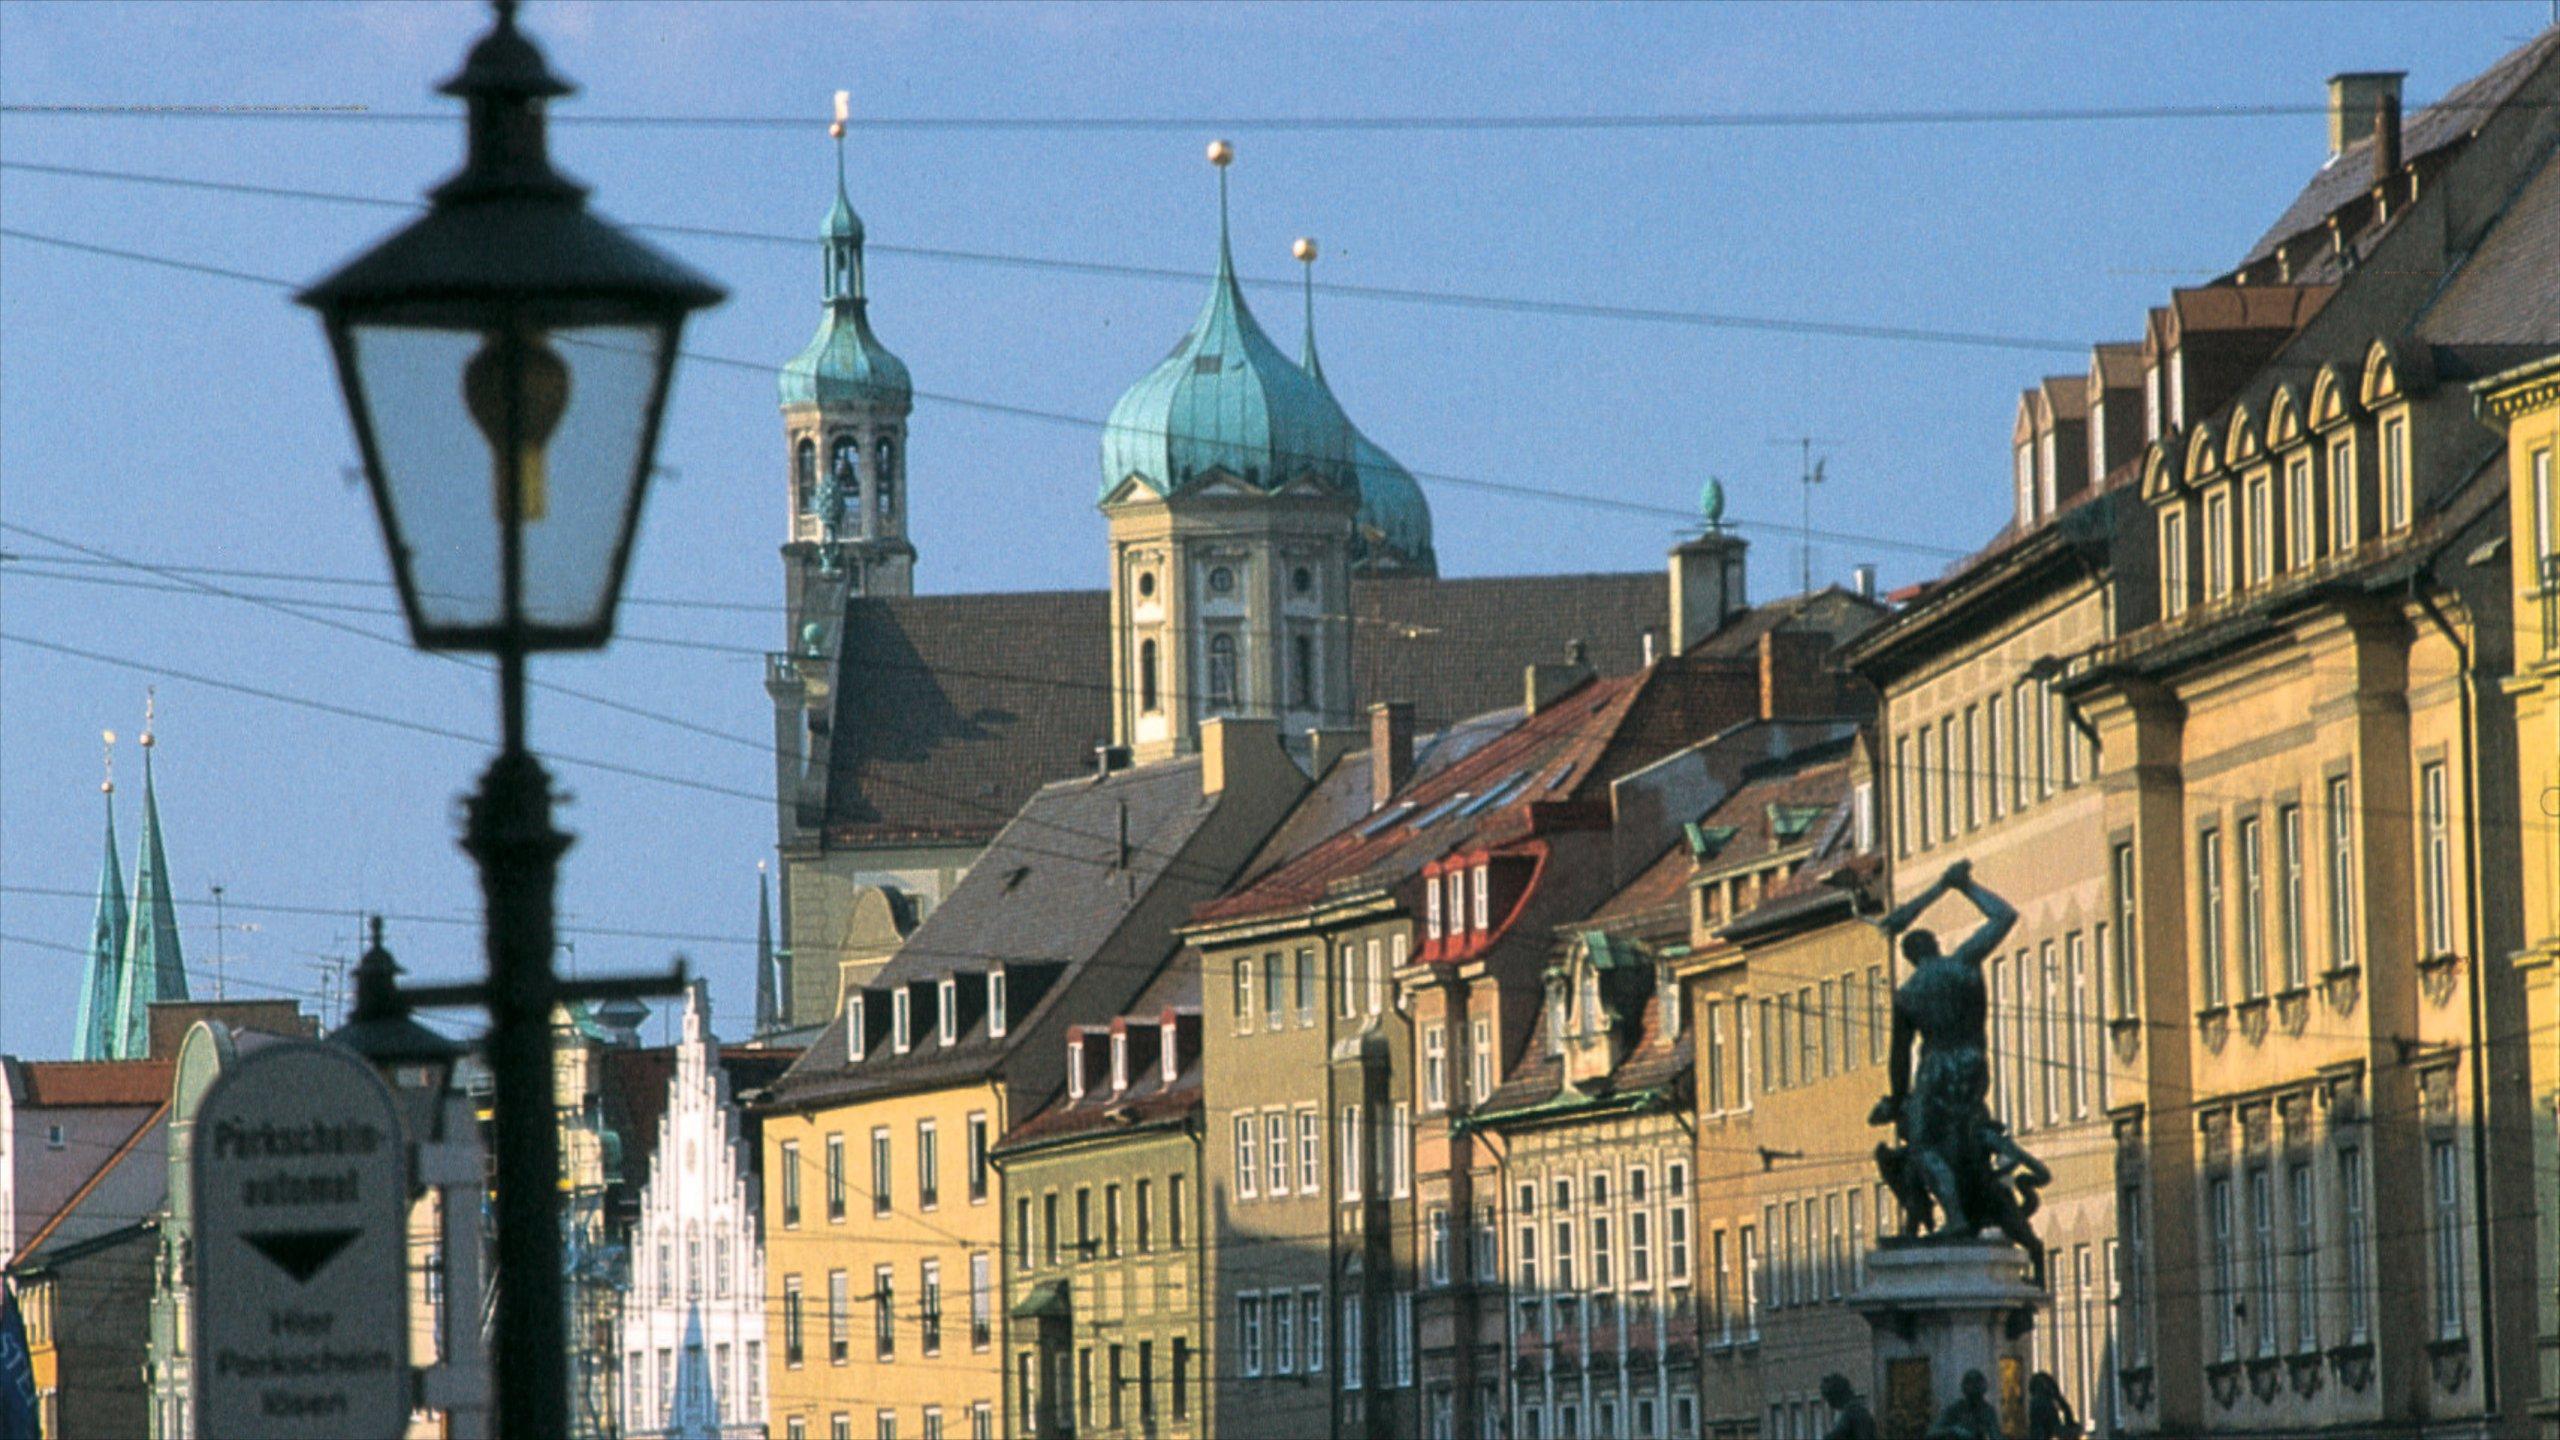 Augsburg caratteristiche di architettura d\'epoca, chiesa o cattedrale e città